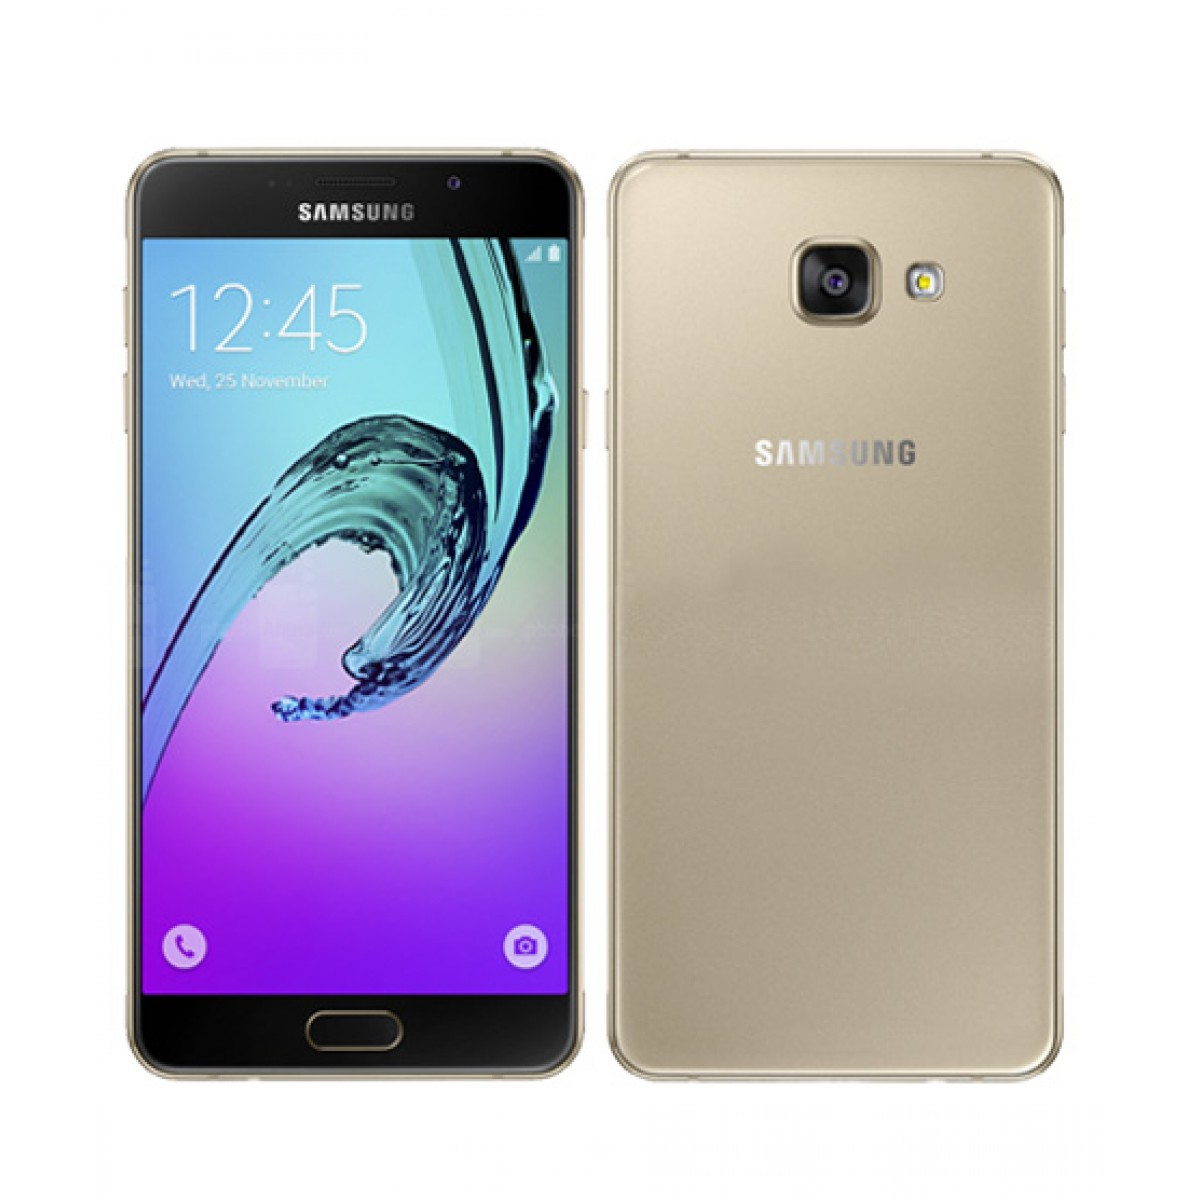 Samsung Galaxy A7 2016 4G Dual Sim Gold (A710FD)